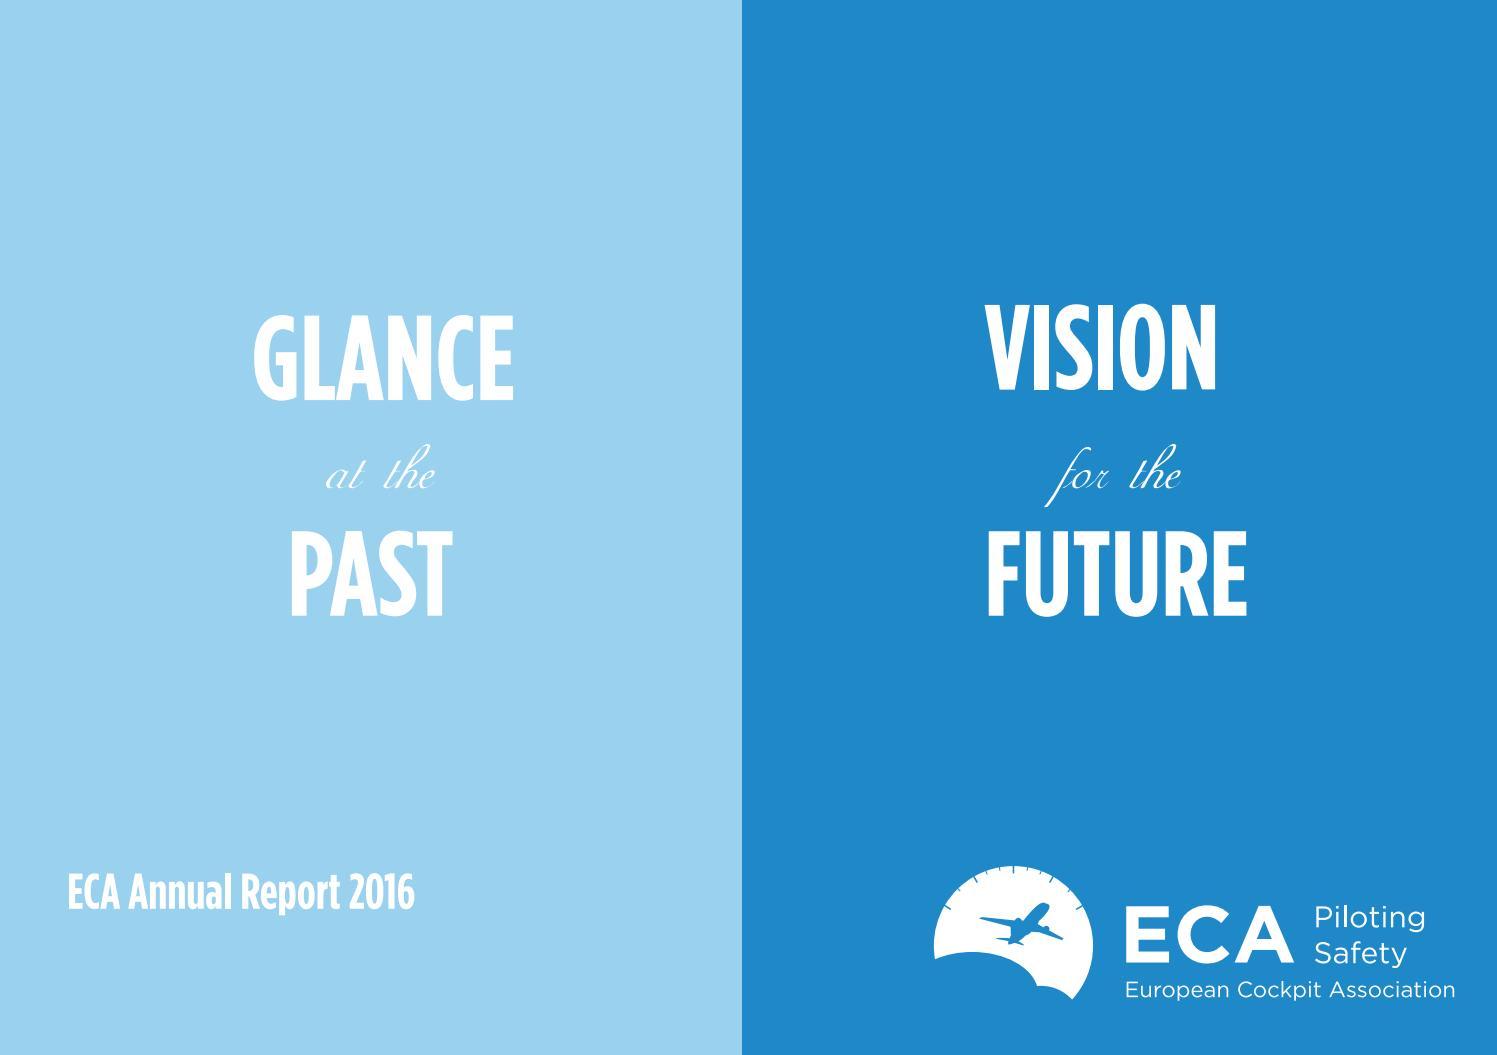 European Cockpit Association Eca: Eca Annual Report 2016 By European Cockpit Association ECA